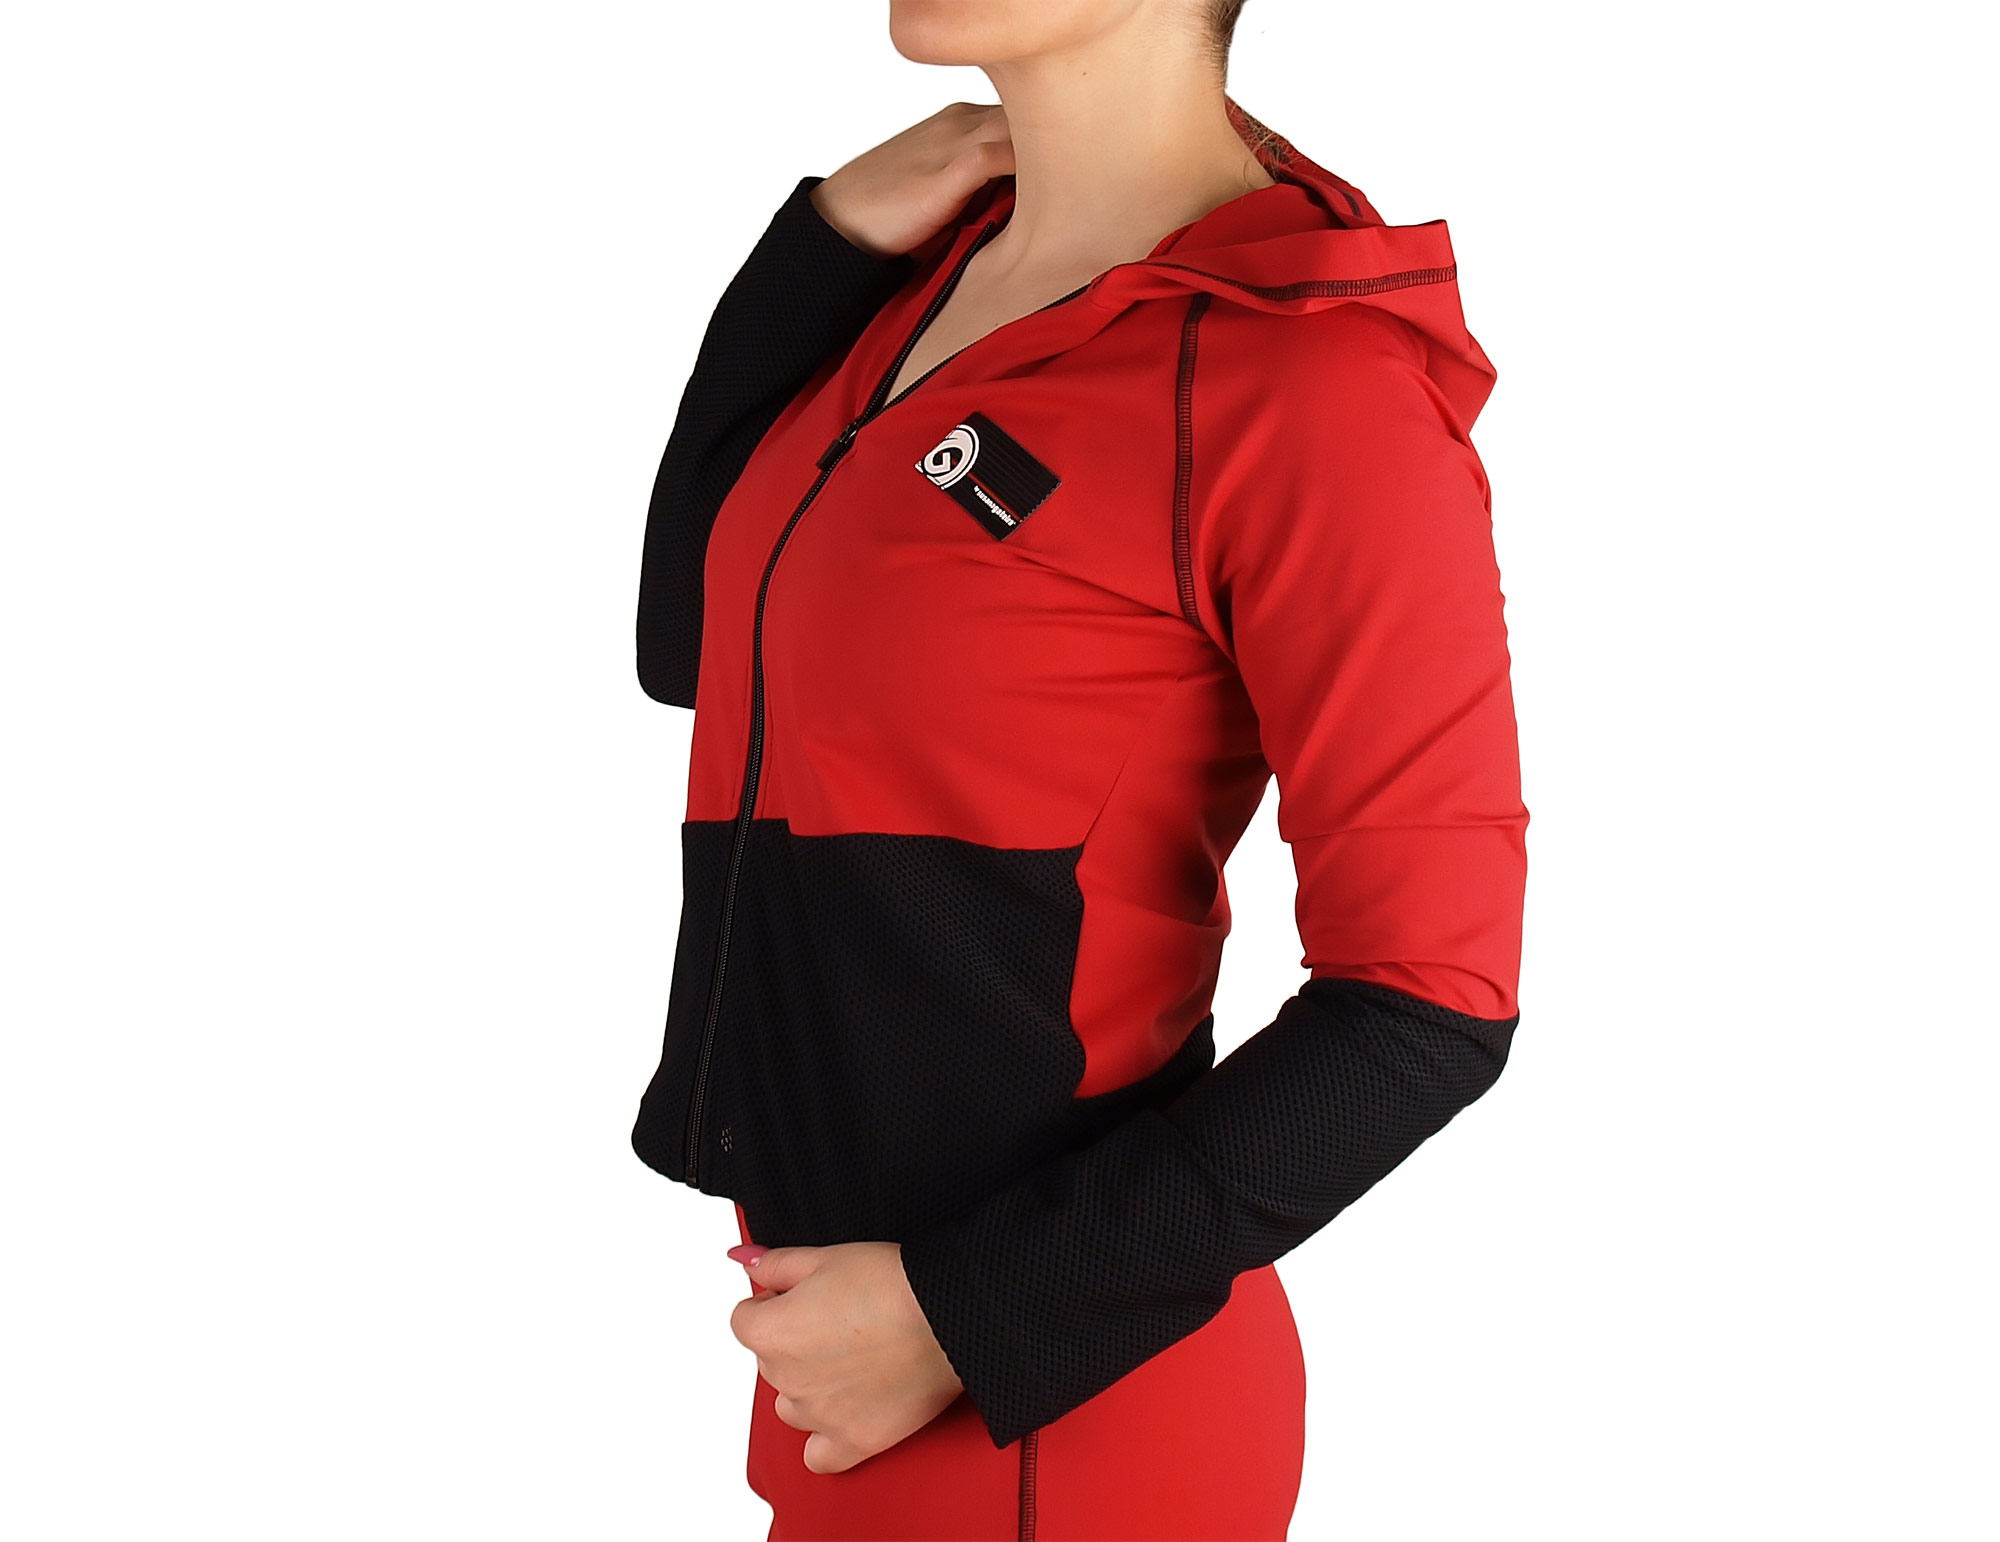 Women's jacket with hood and zipper